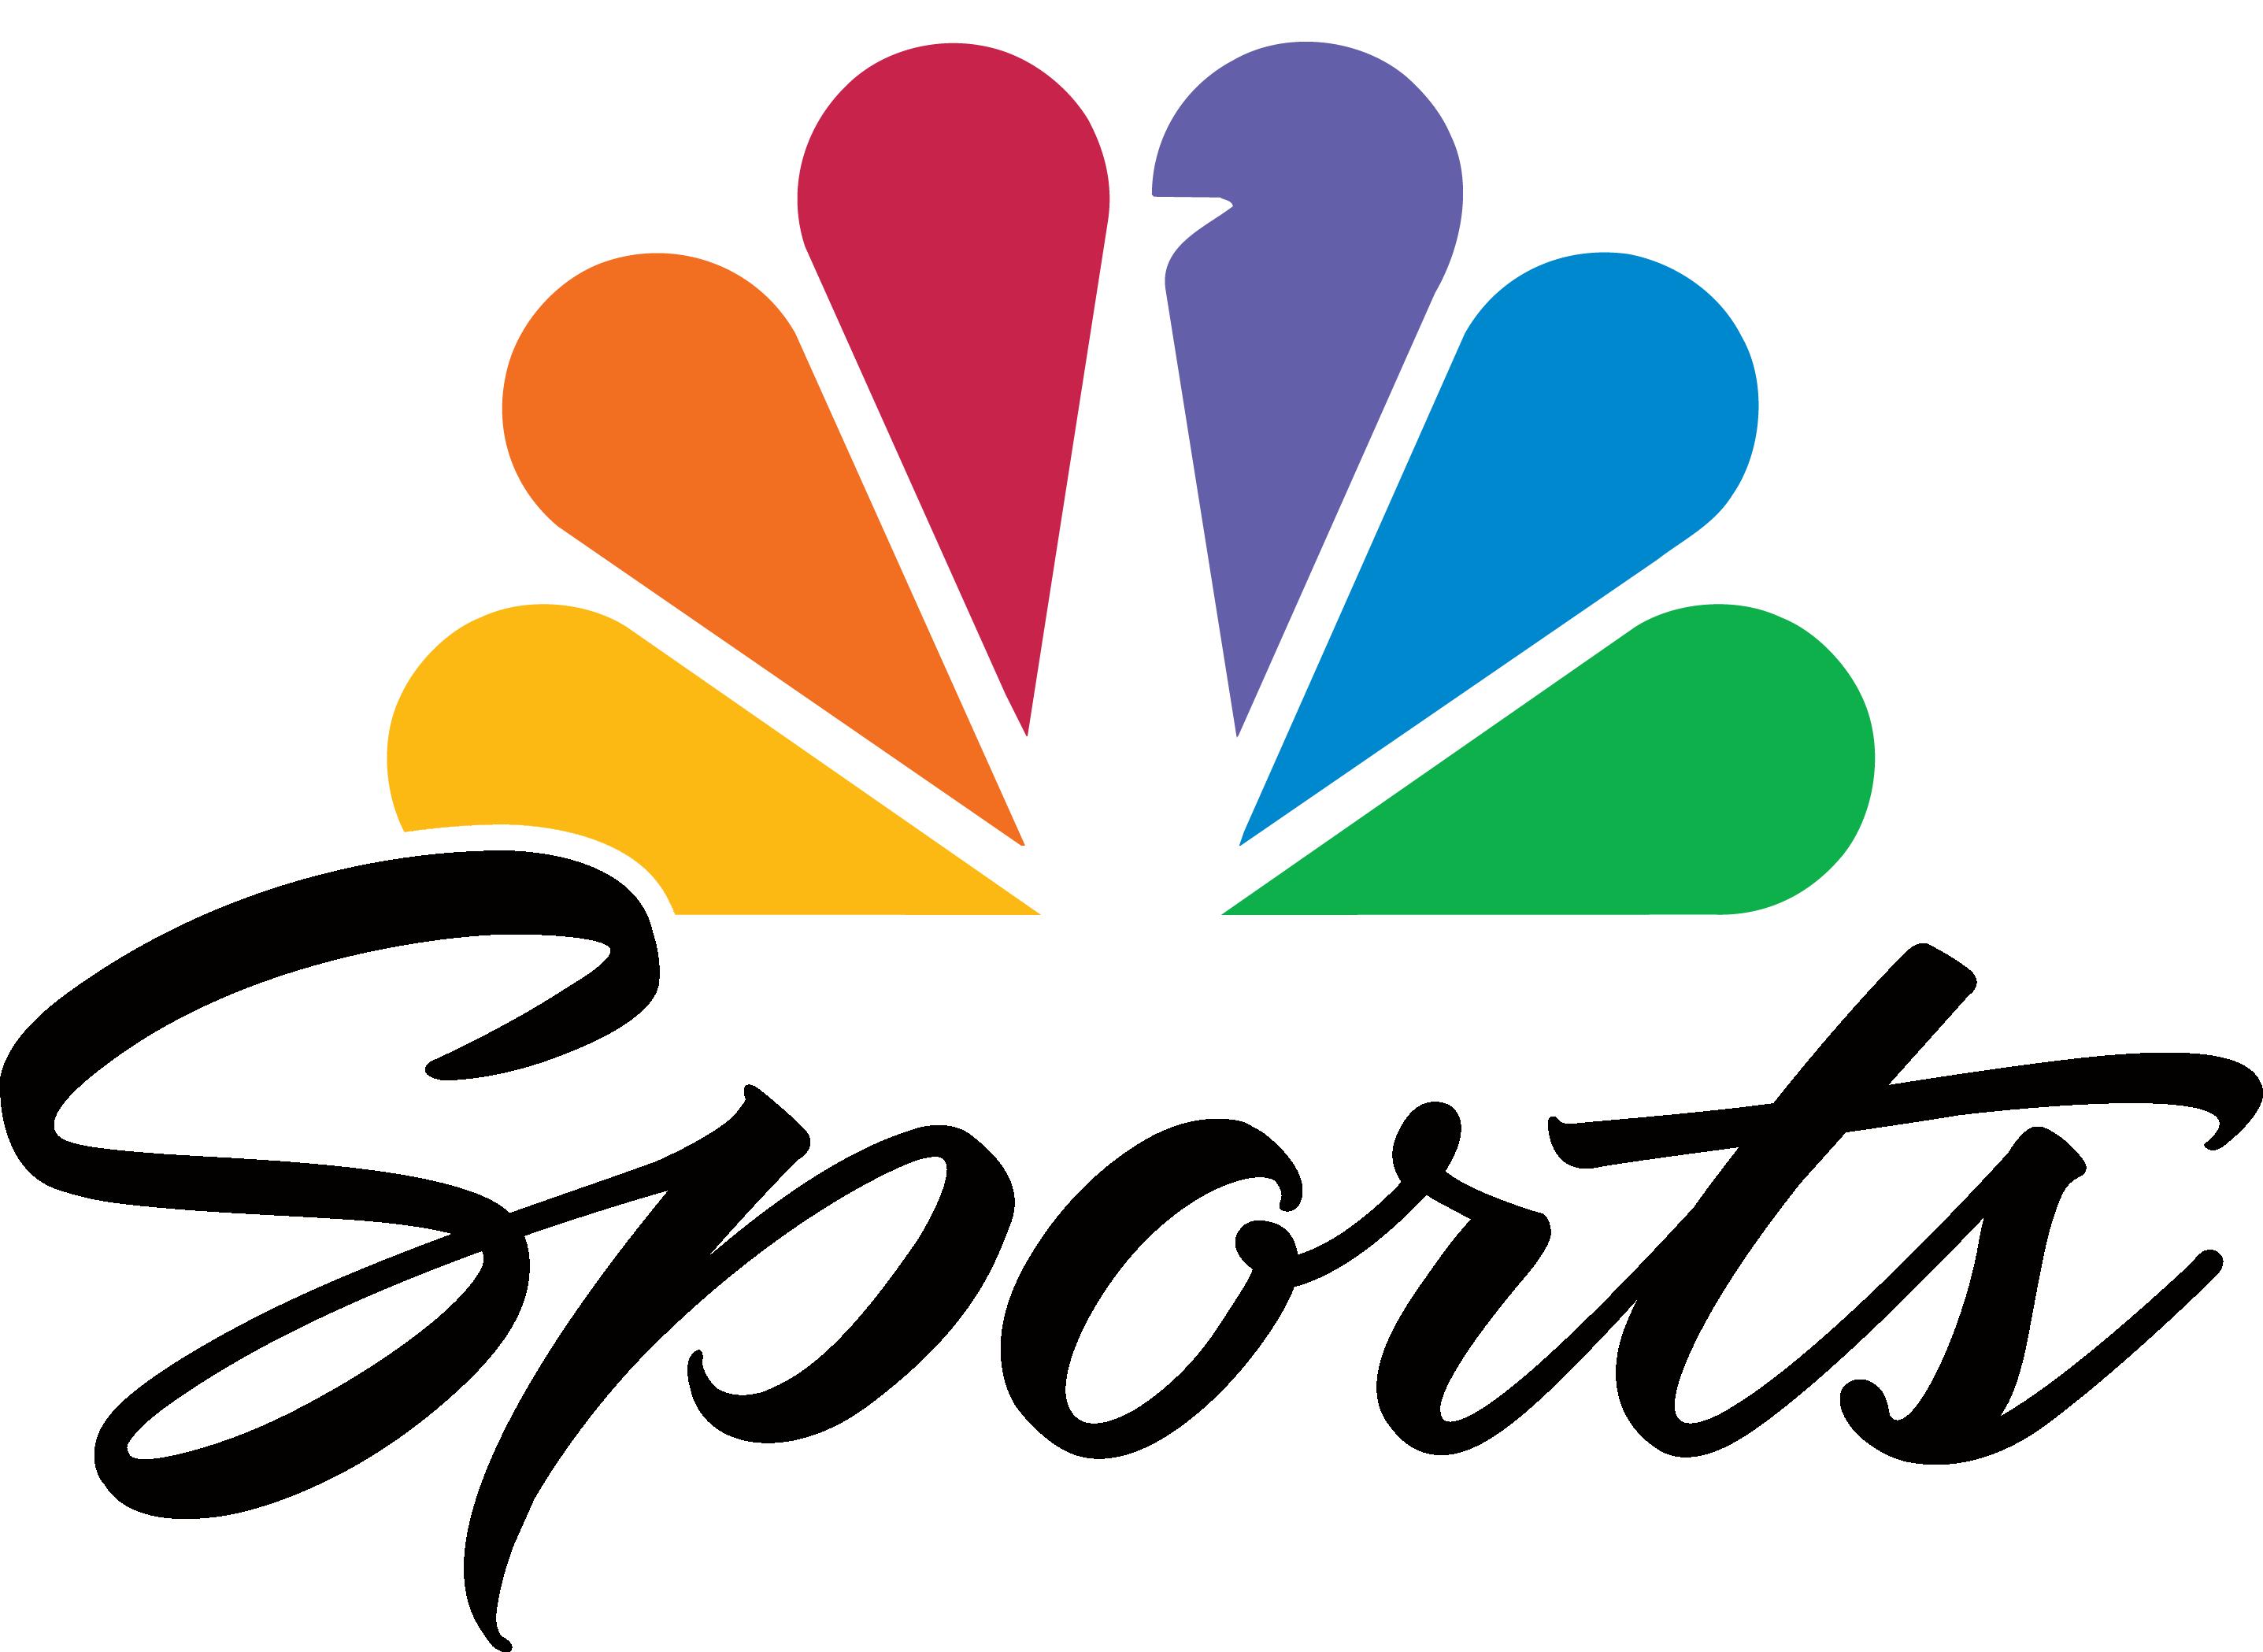 Nbc logos videos alternative. Youtube clipart battlefield